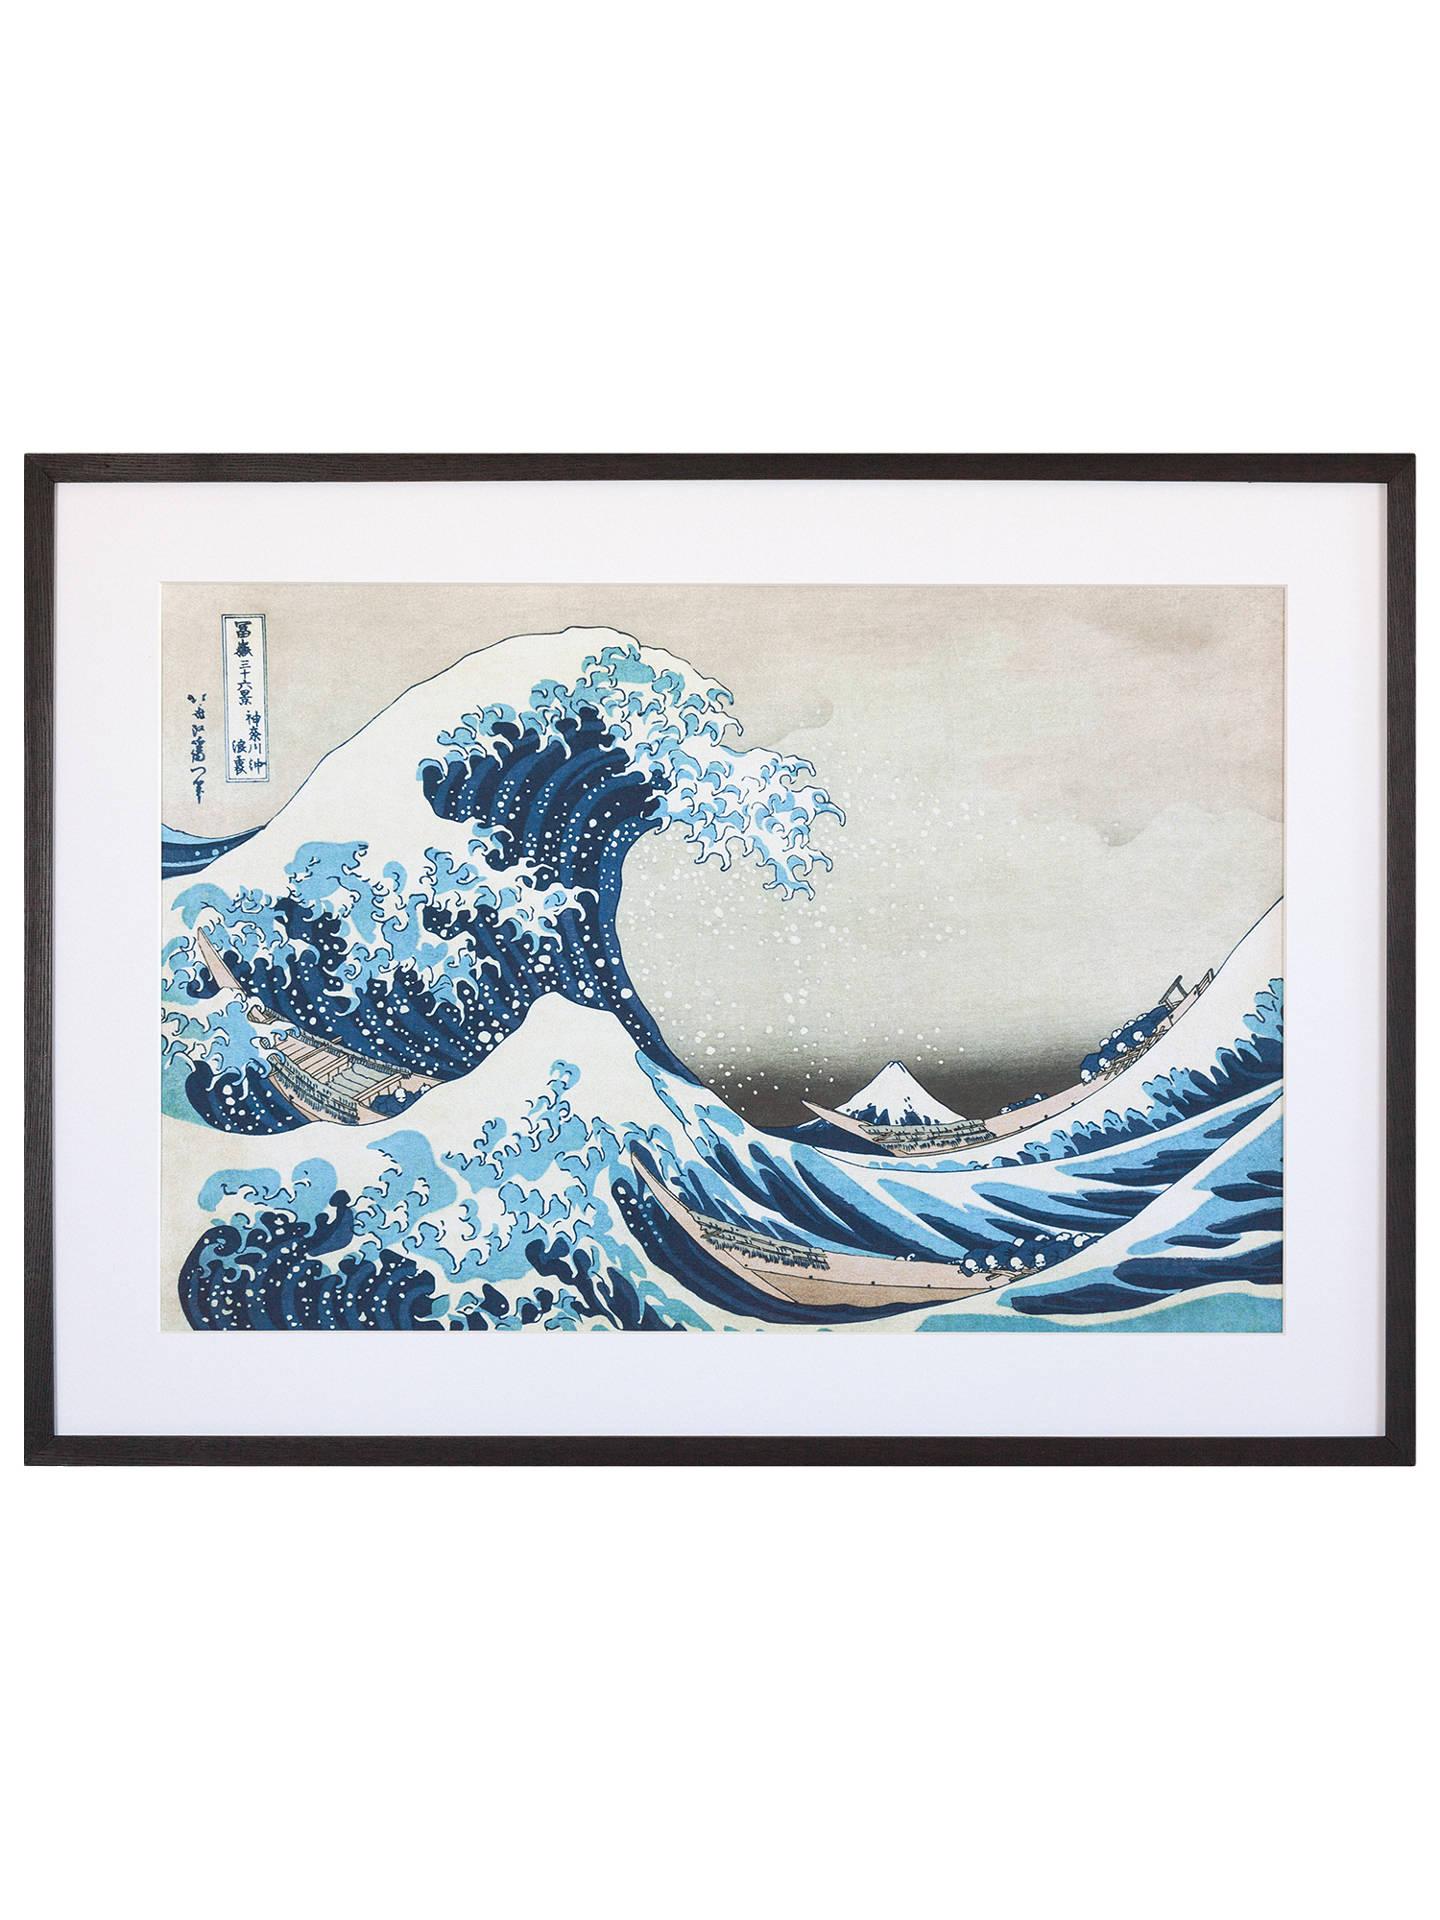 31fc581e4 Buy Katsushika Hokusai - The Great Wave off Kanagawa, Grey Painted Ash  Framed Print Online